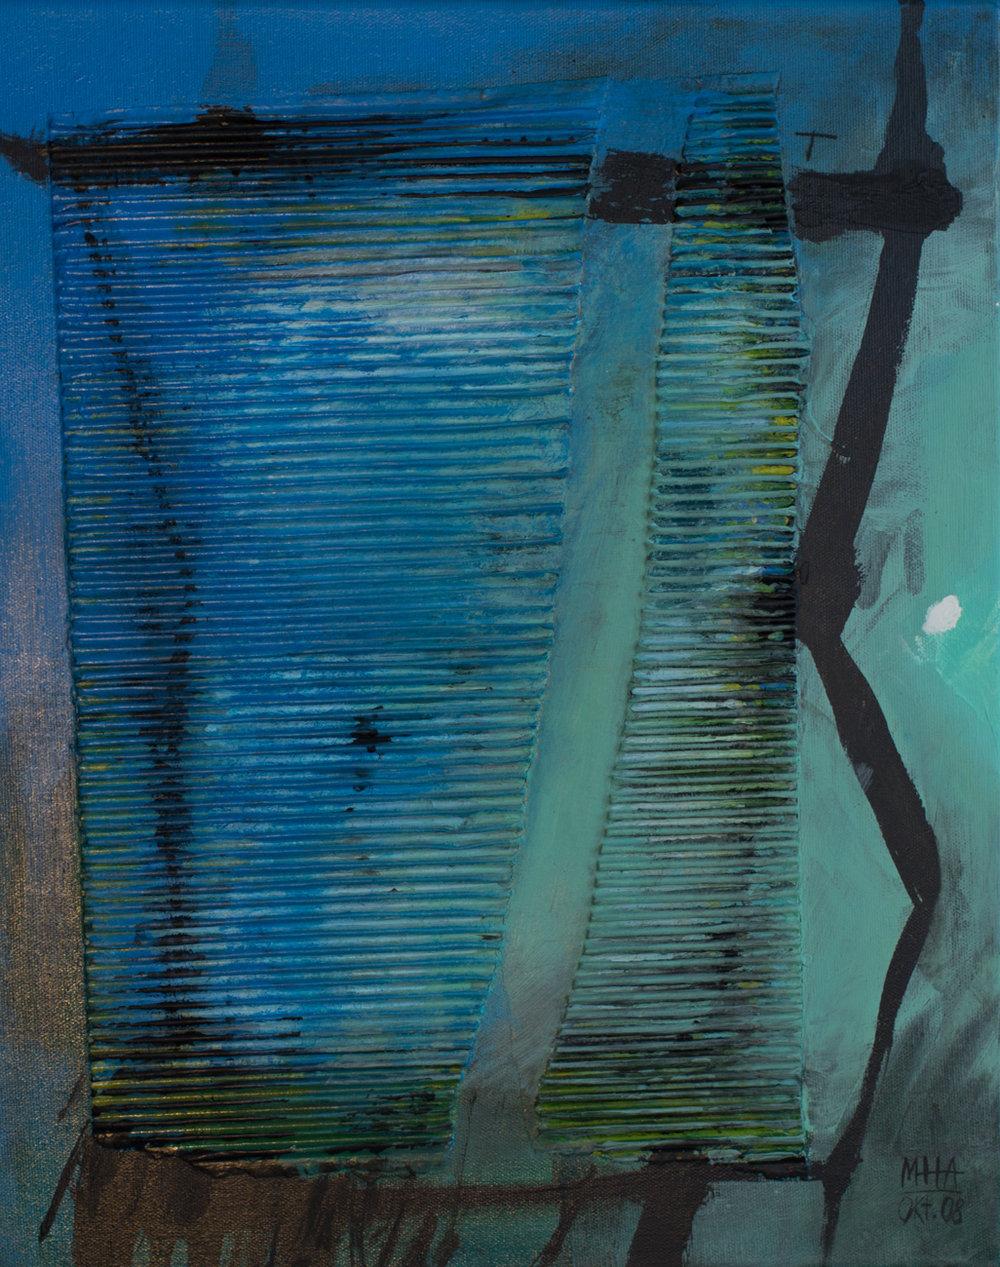 Theos 1 , 2008,Collage mit Acryl auf Leinwand, 40x50 cm